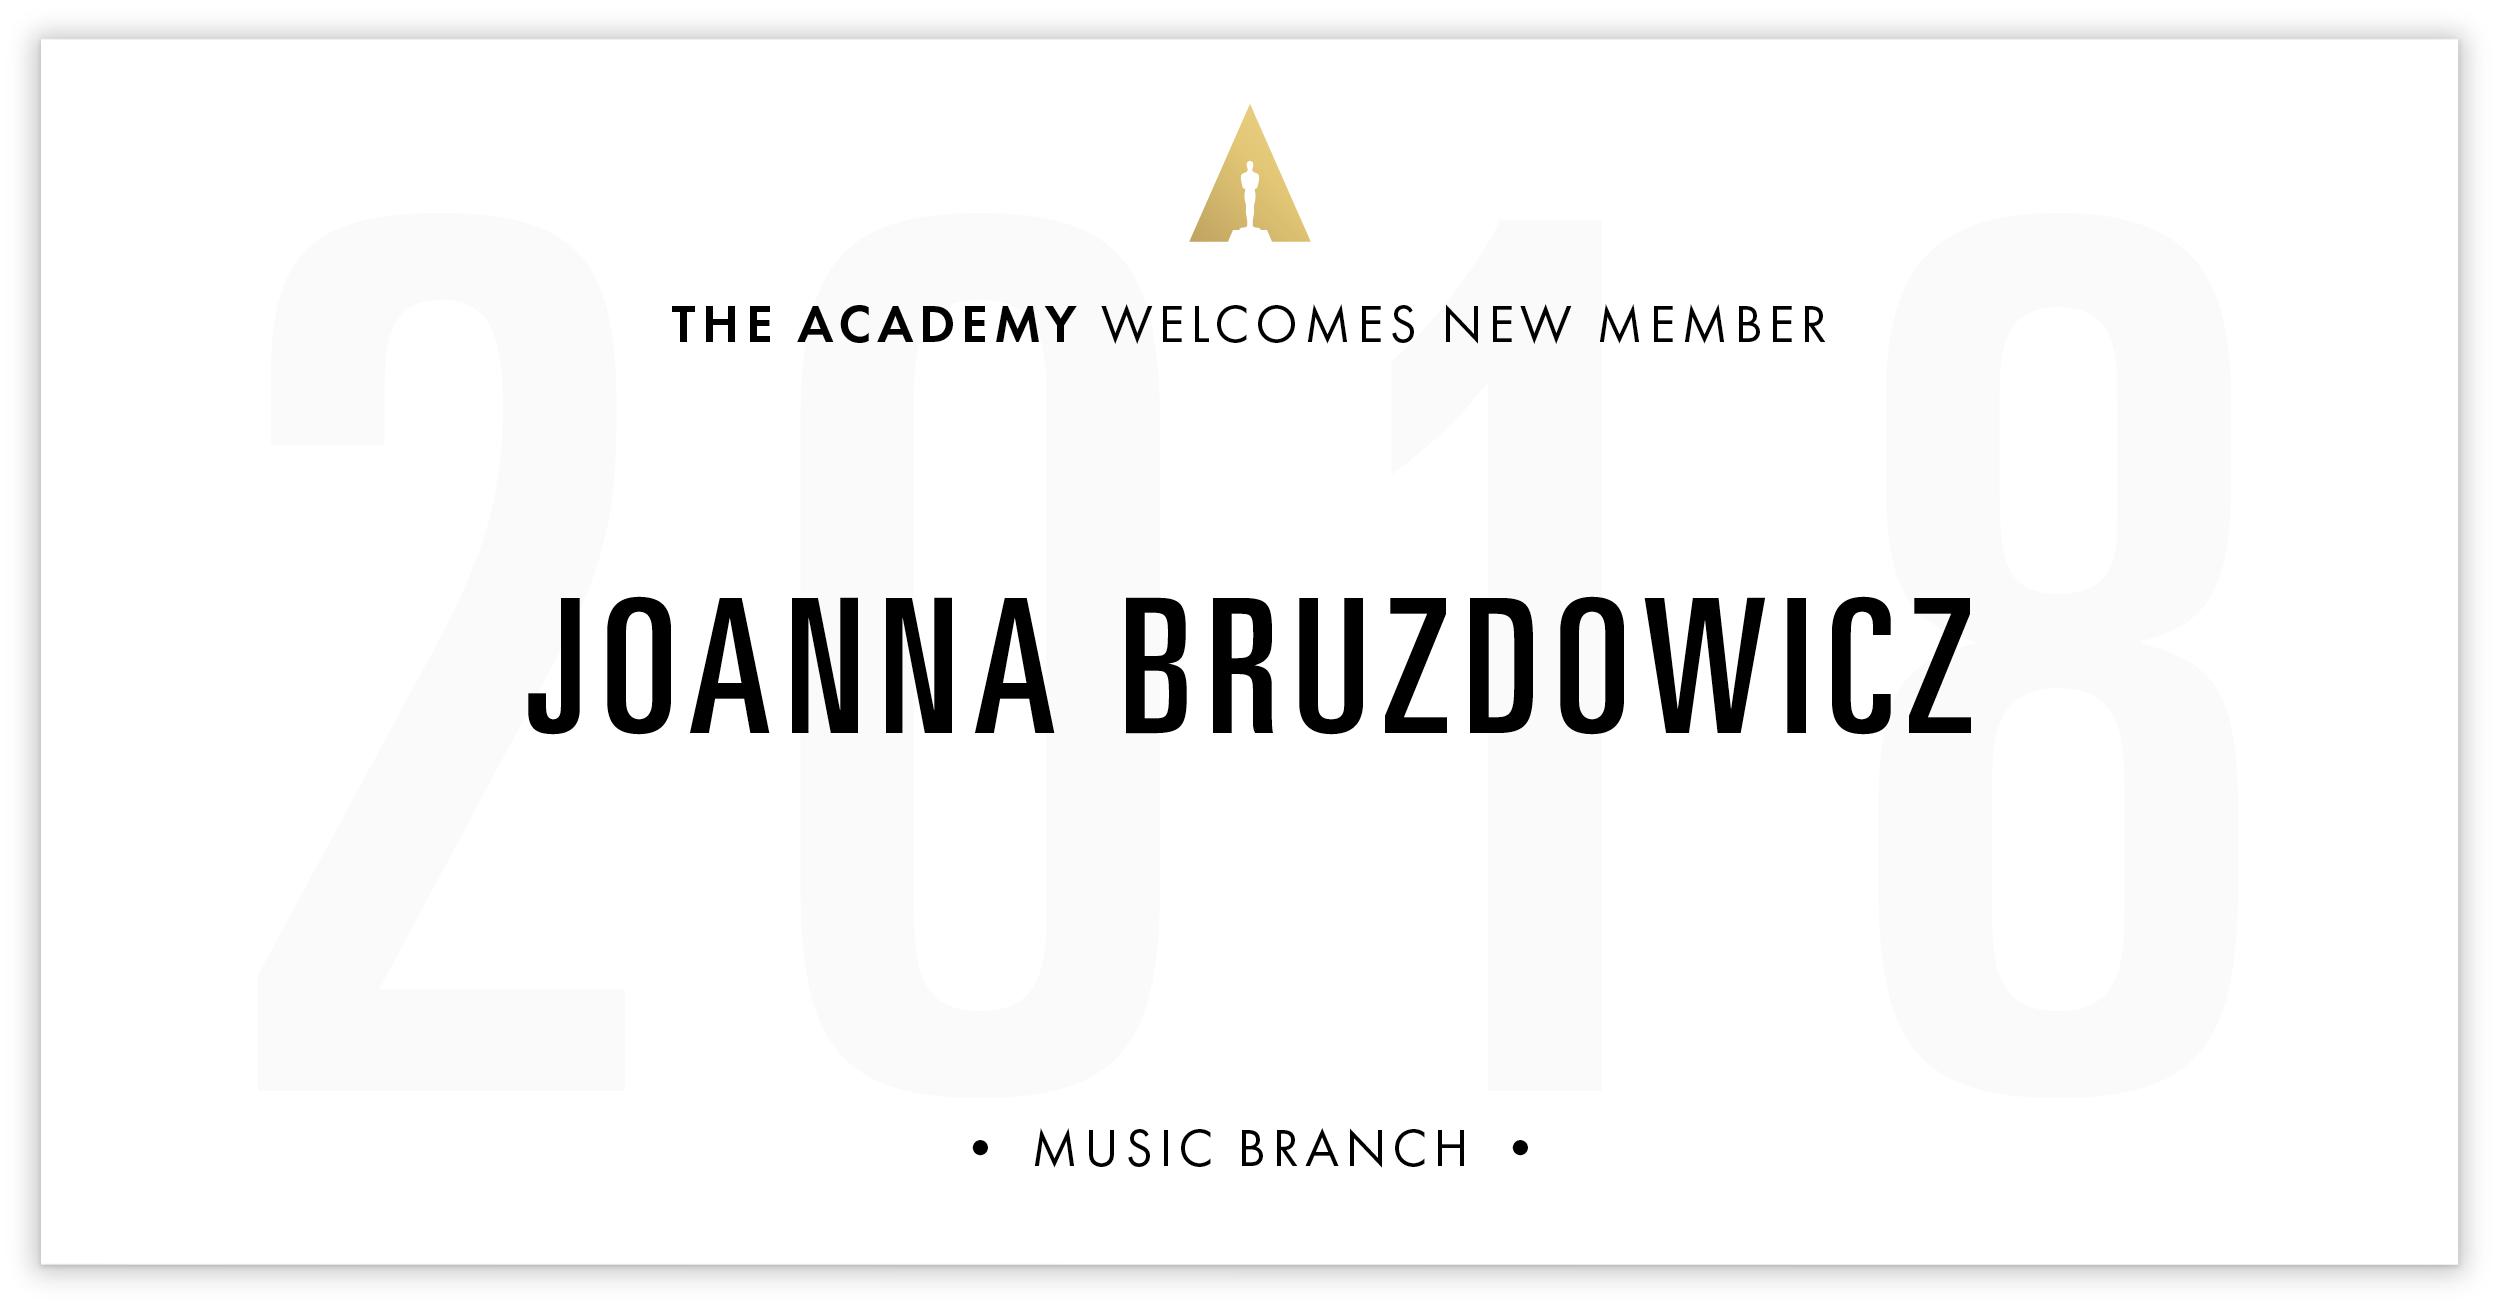 Joanna Bruzdowicz is invited!